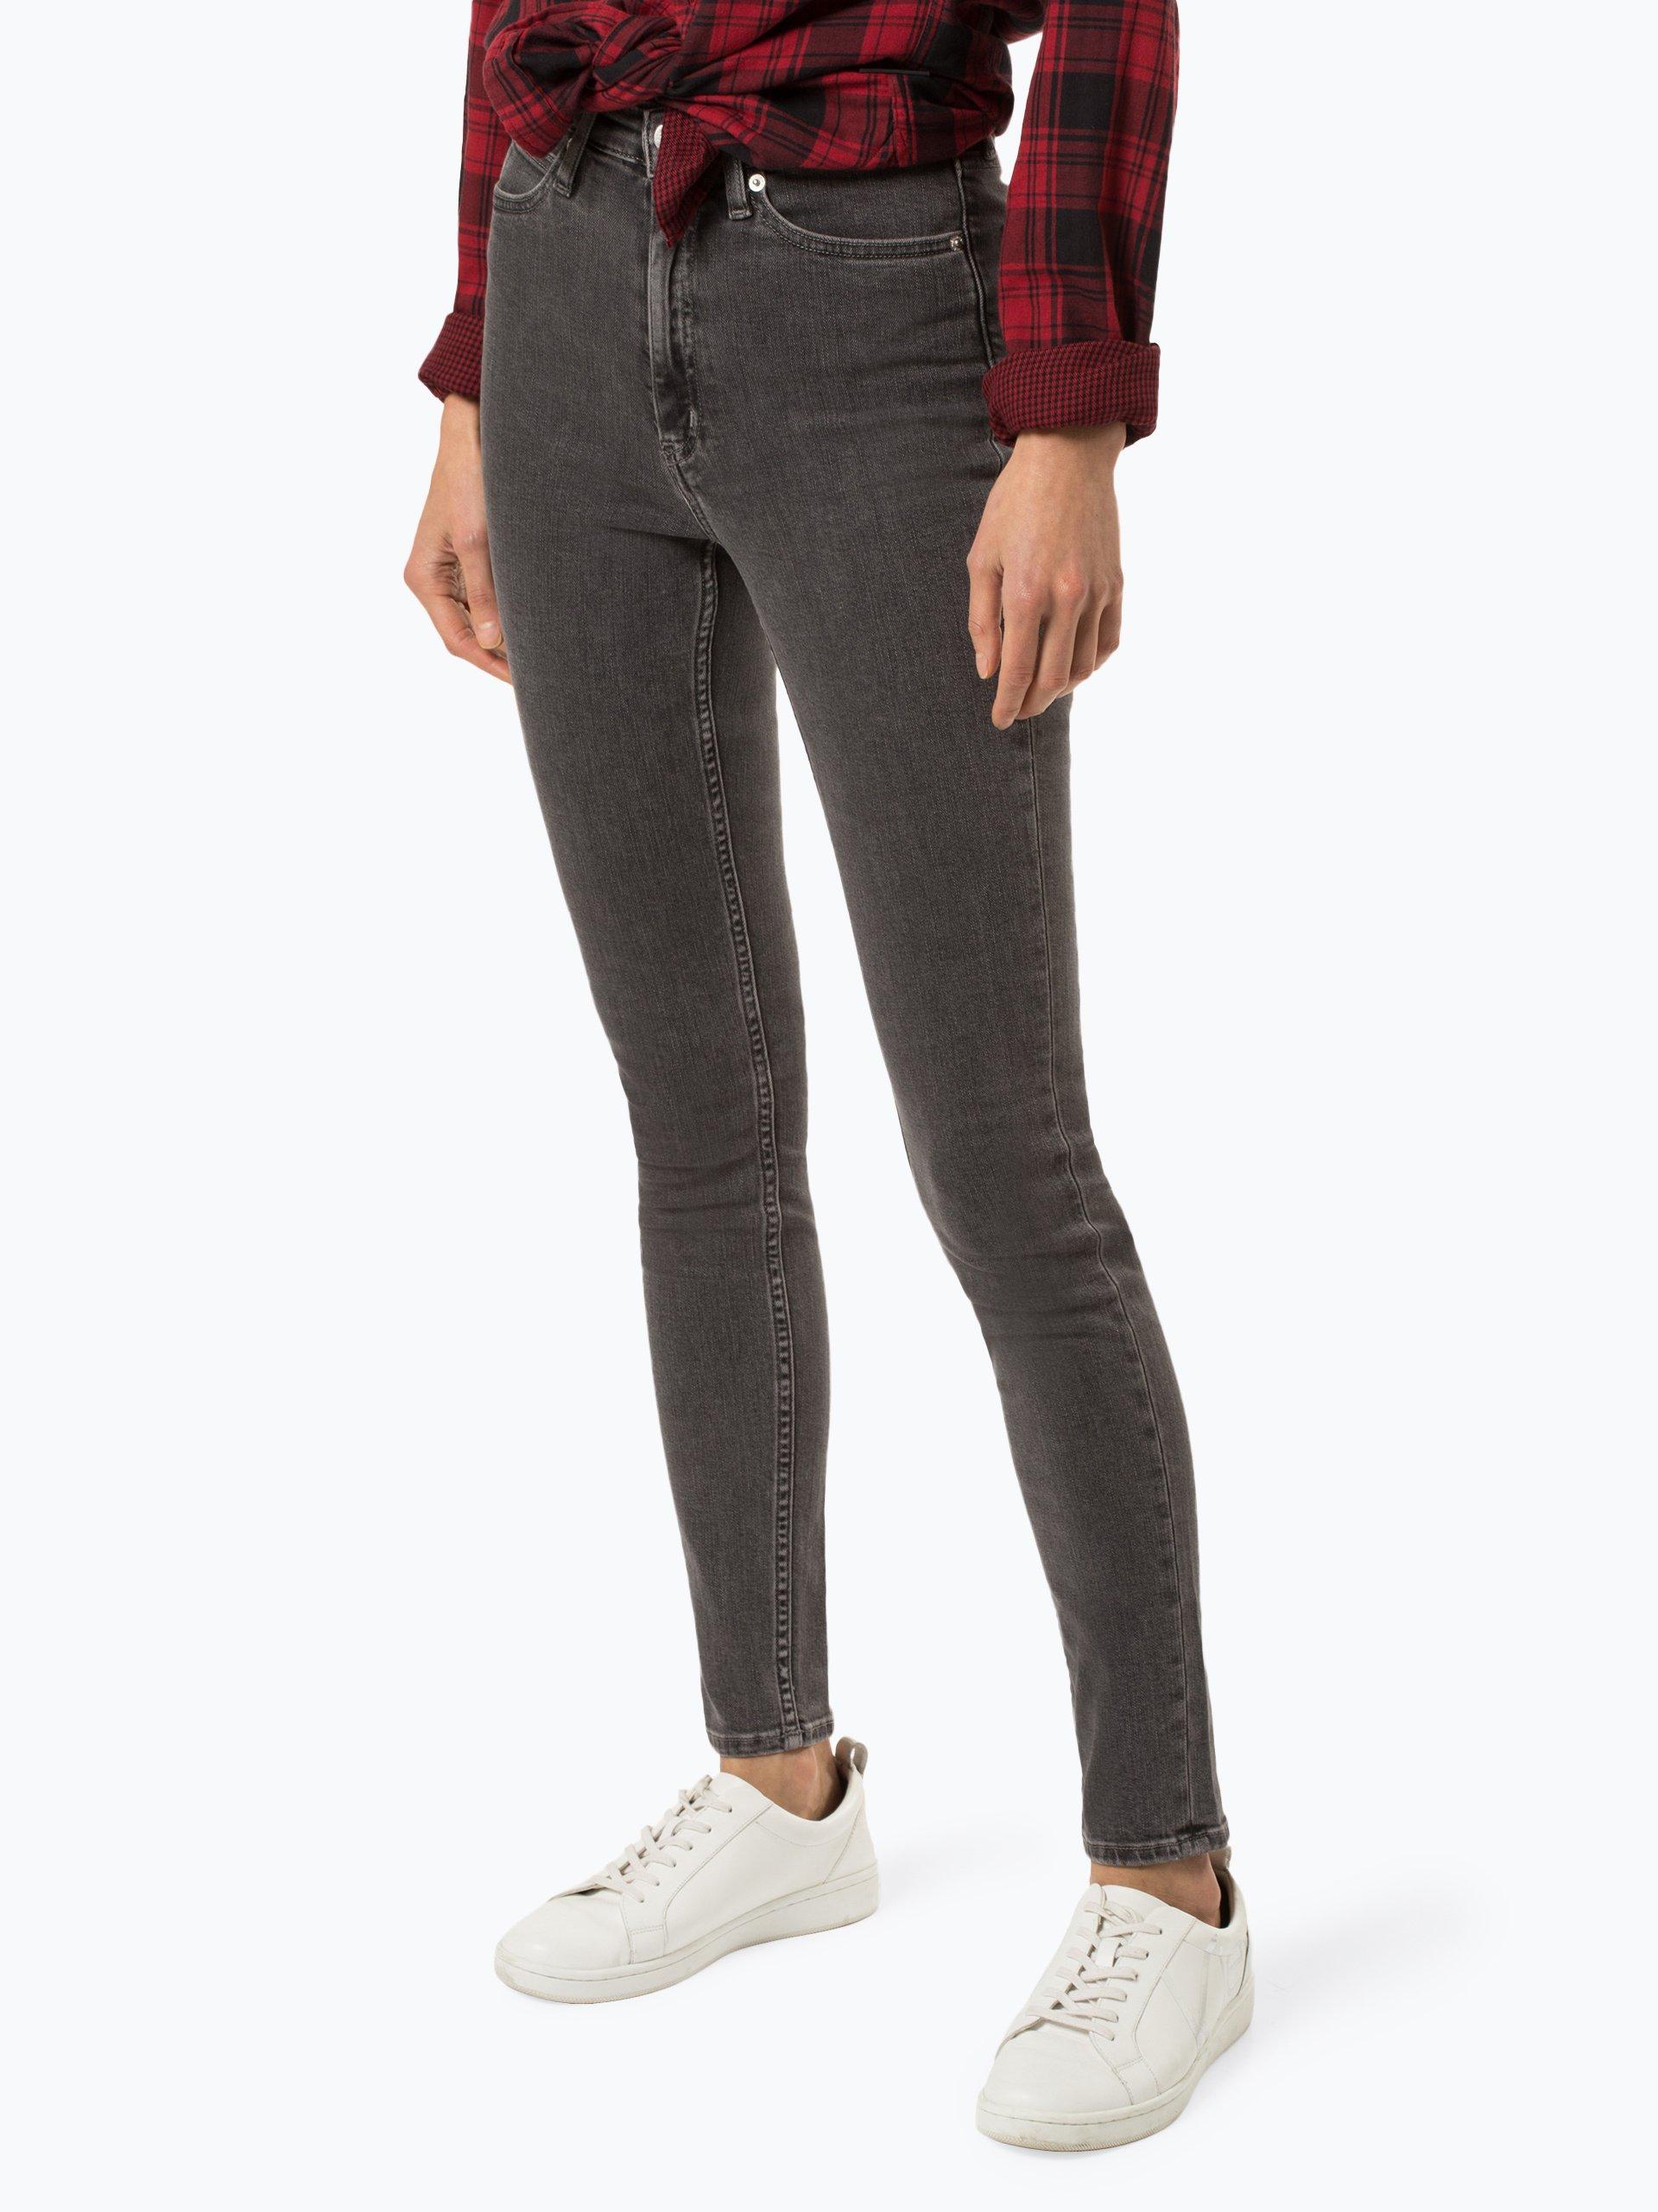 Calvin Klein Jeans Damen Jeans - CKJ 010